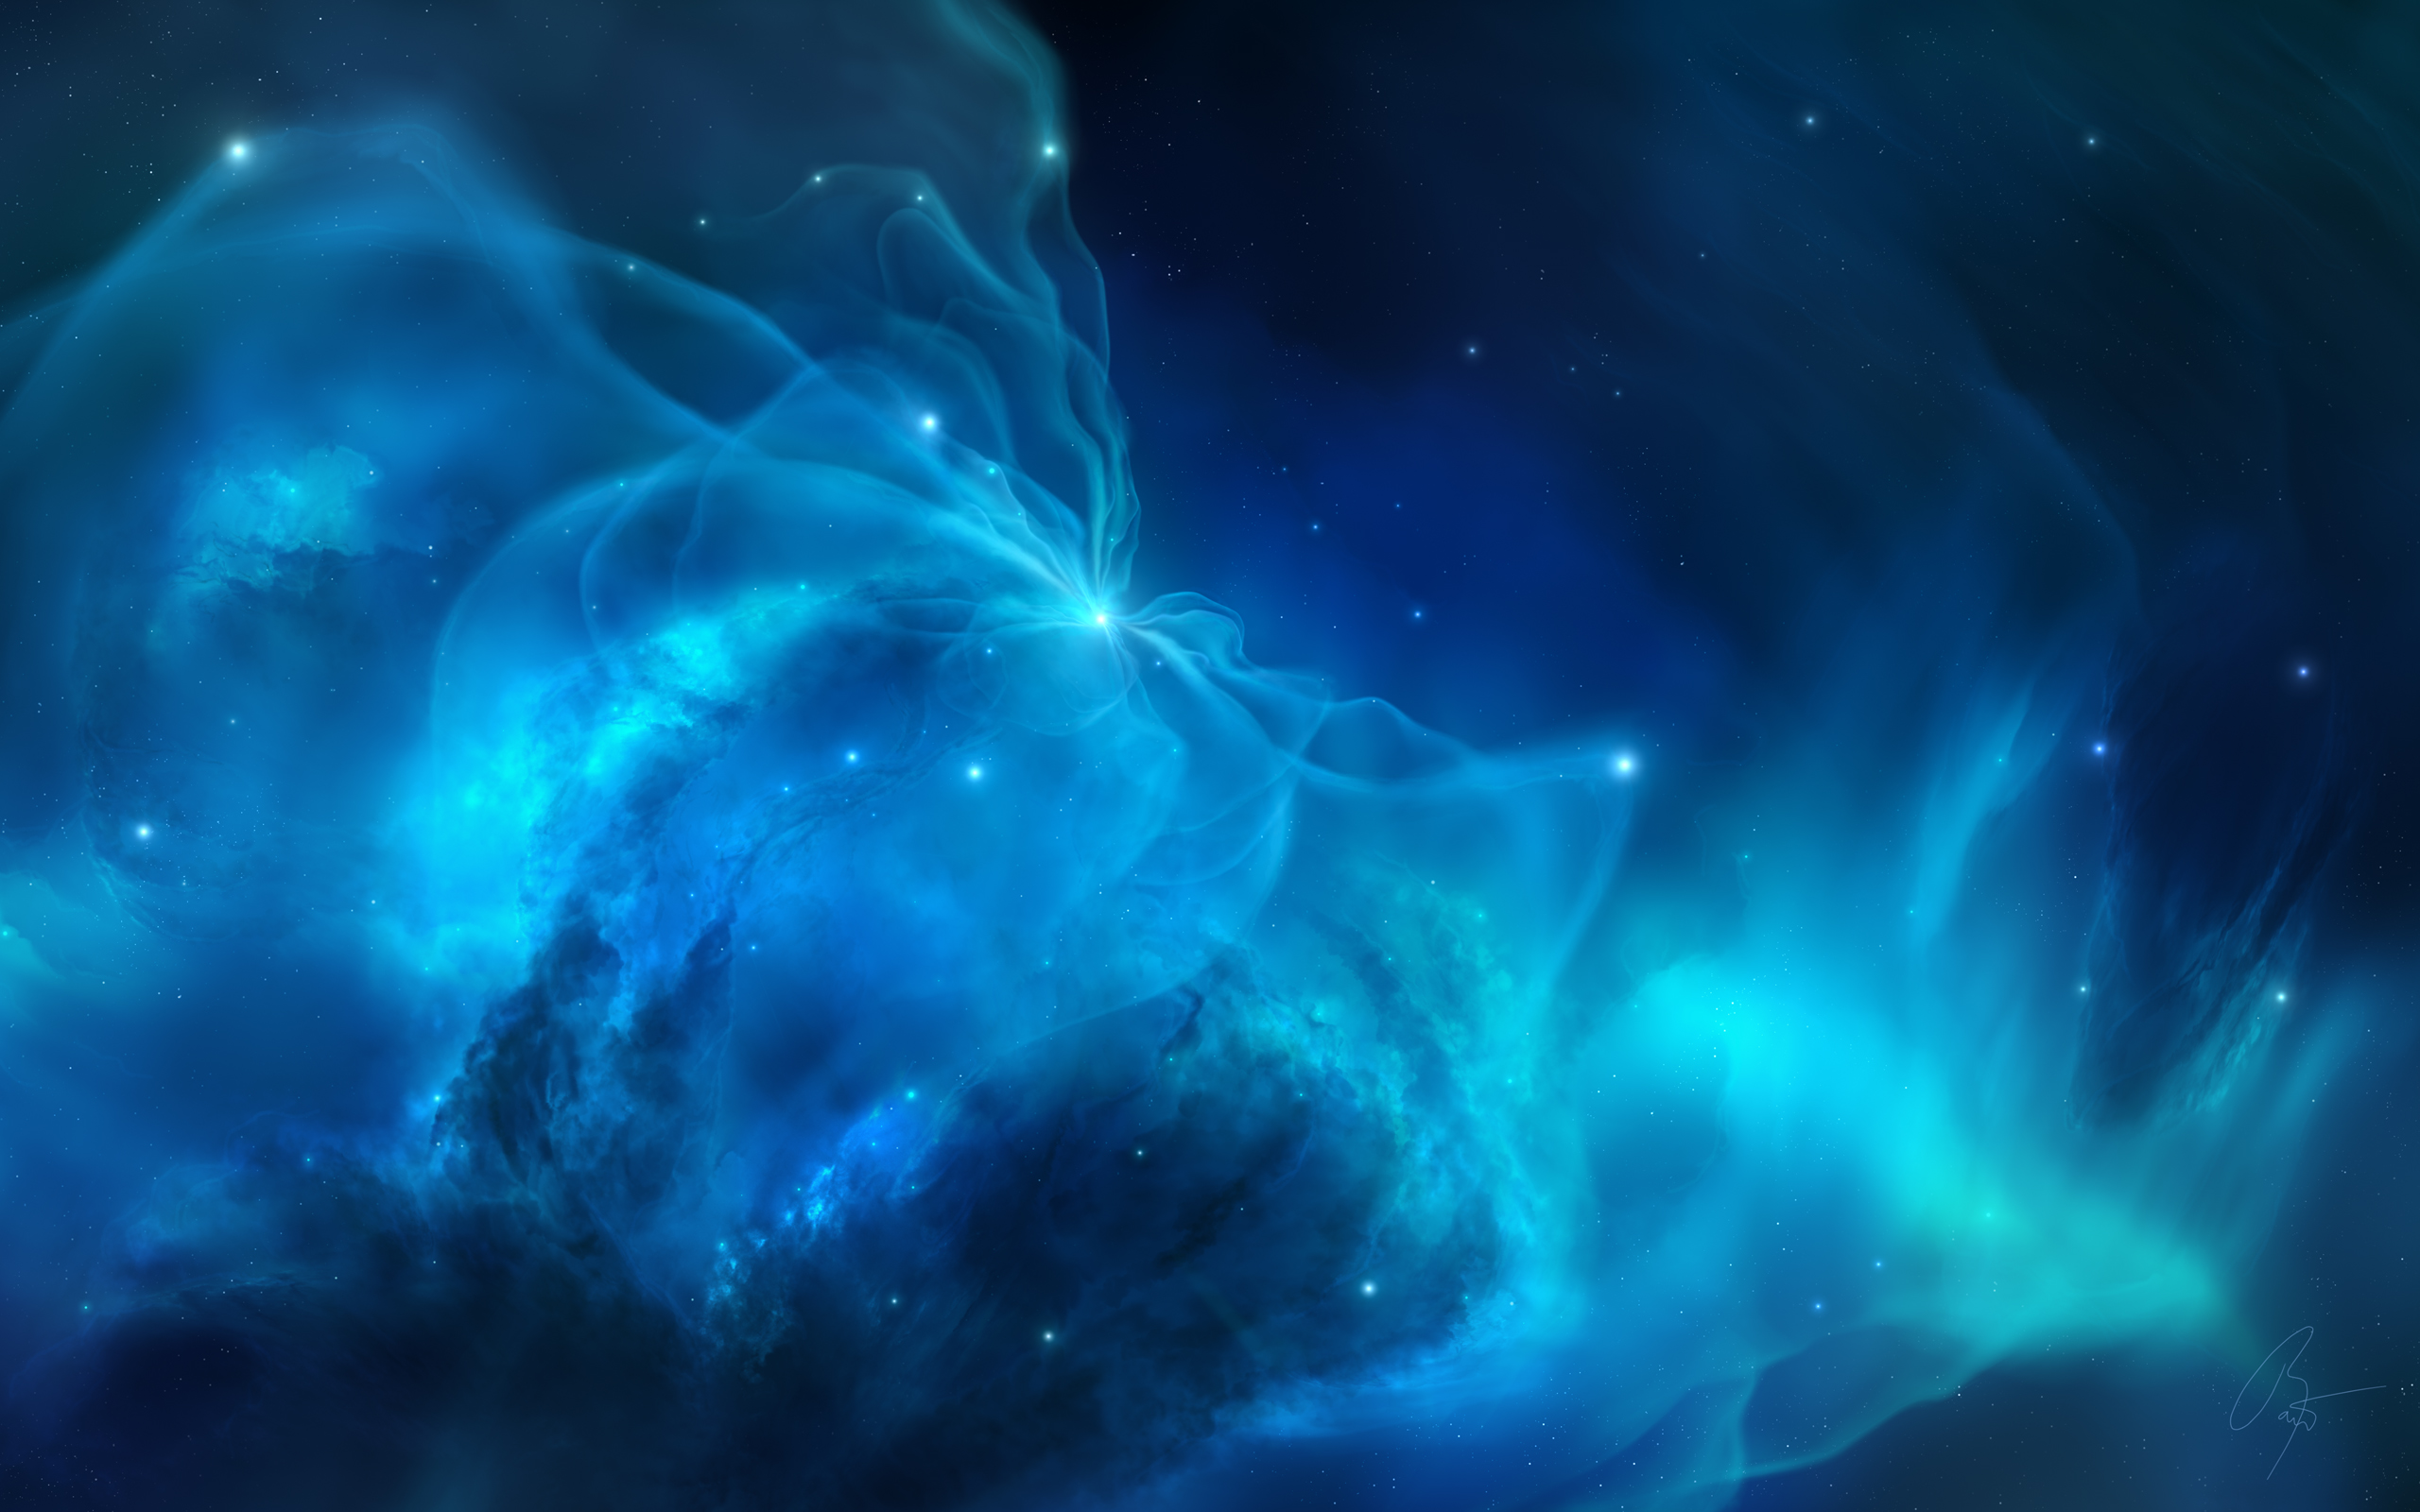 Blue nebula wallpaper wallpapersafari - 1080p nebula wallpaper ...